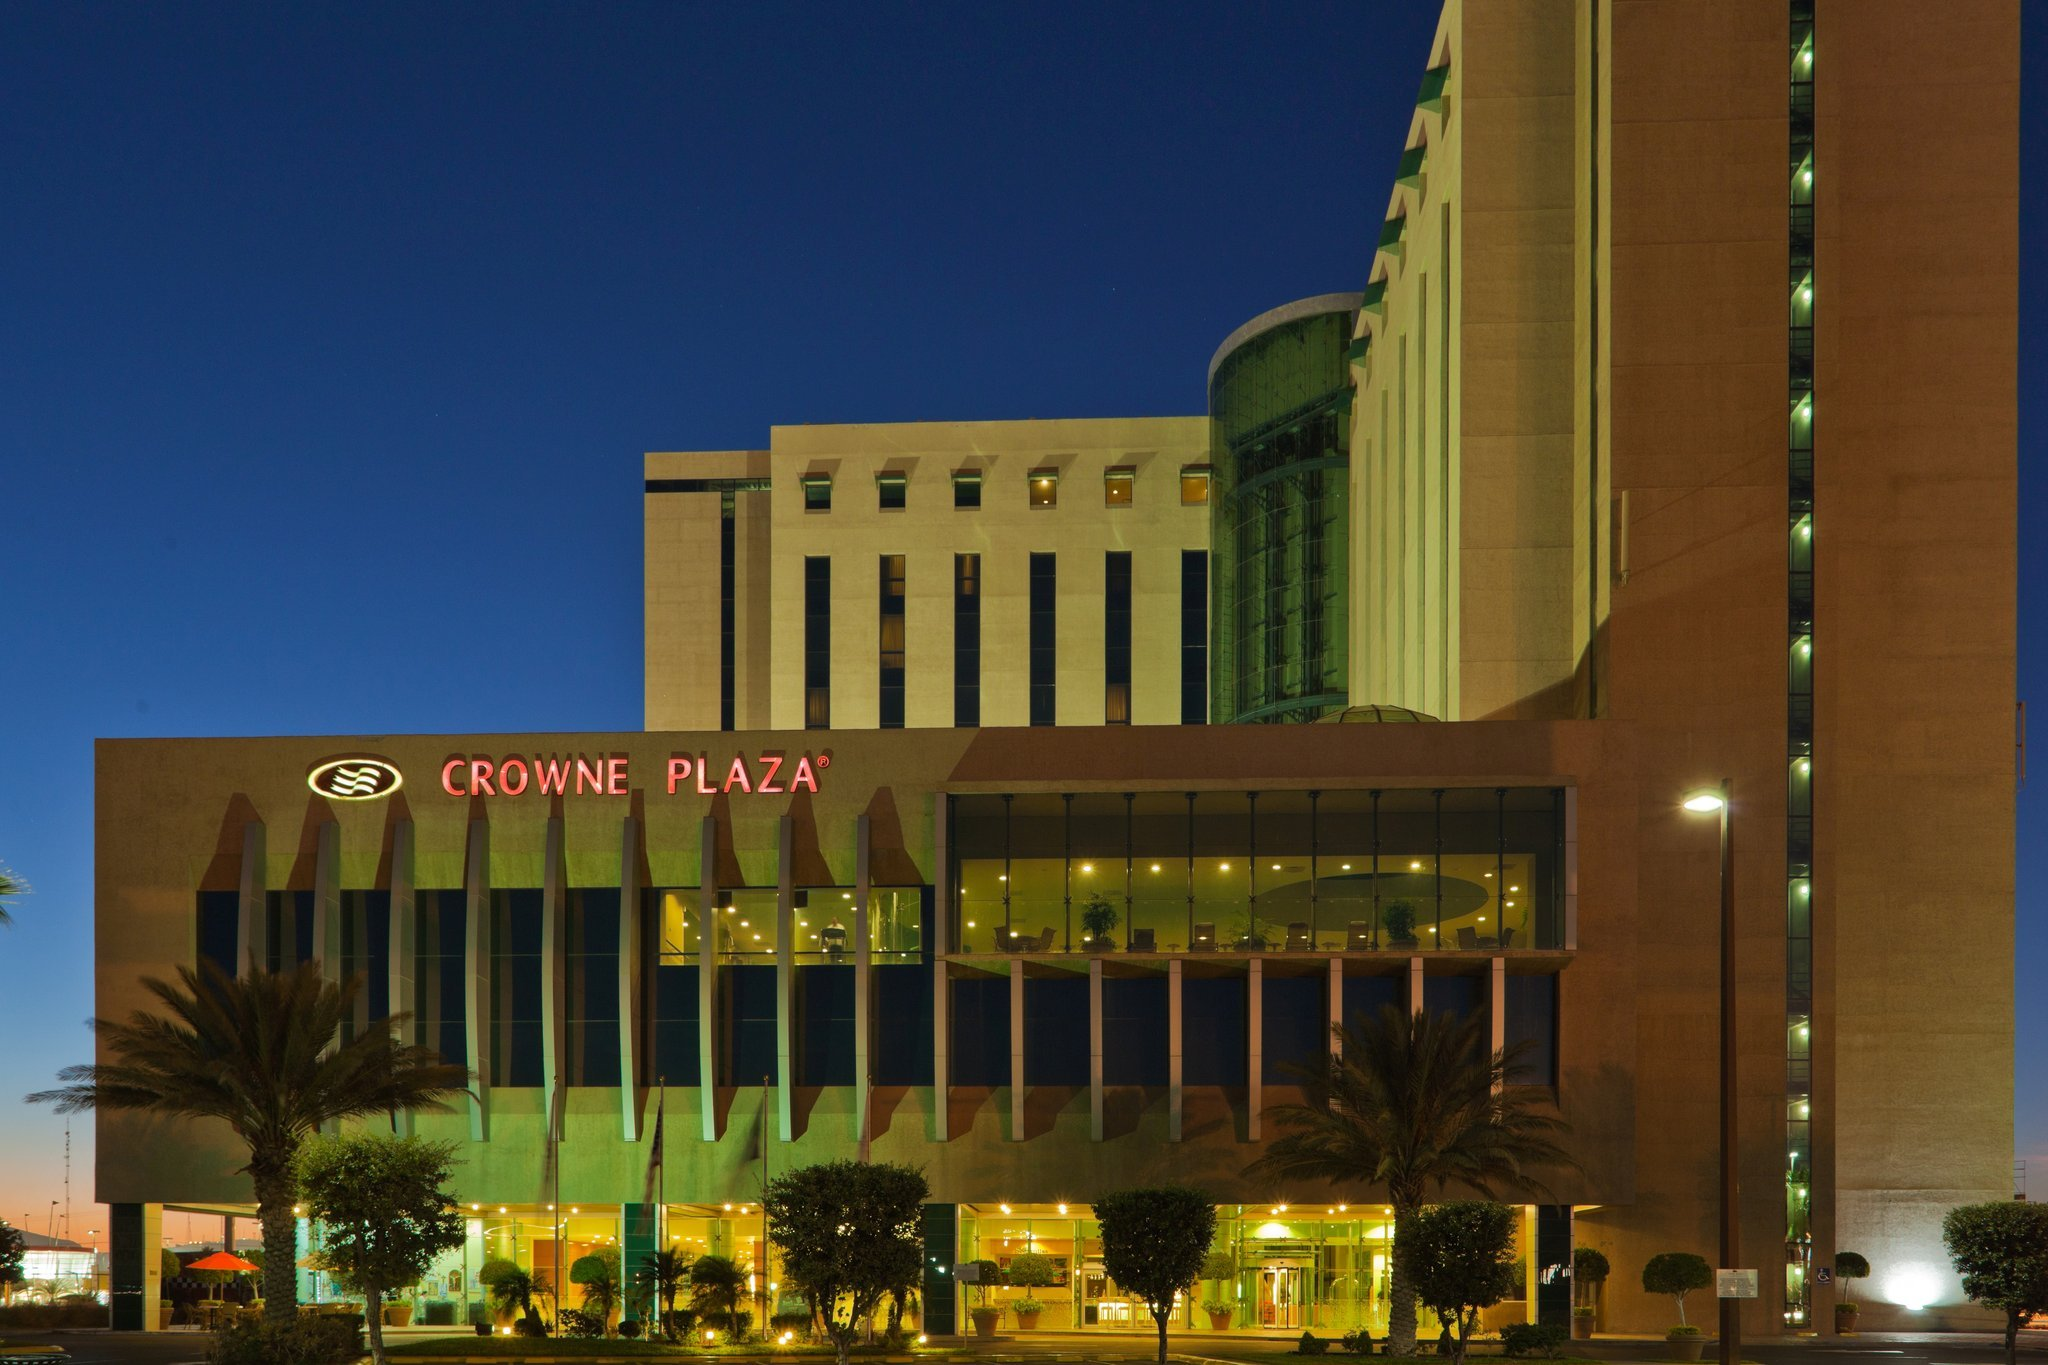 Crowne Plaza Torreon